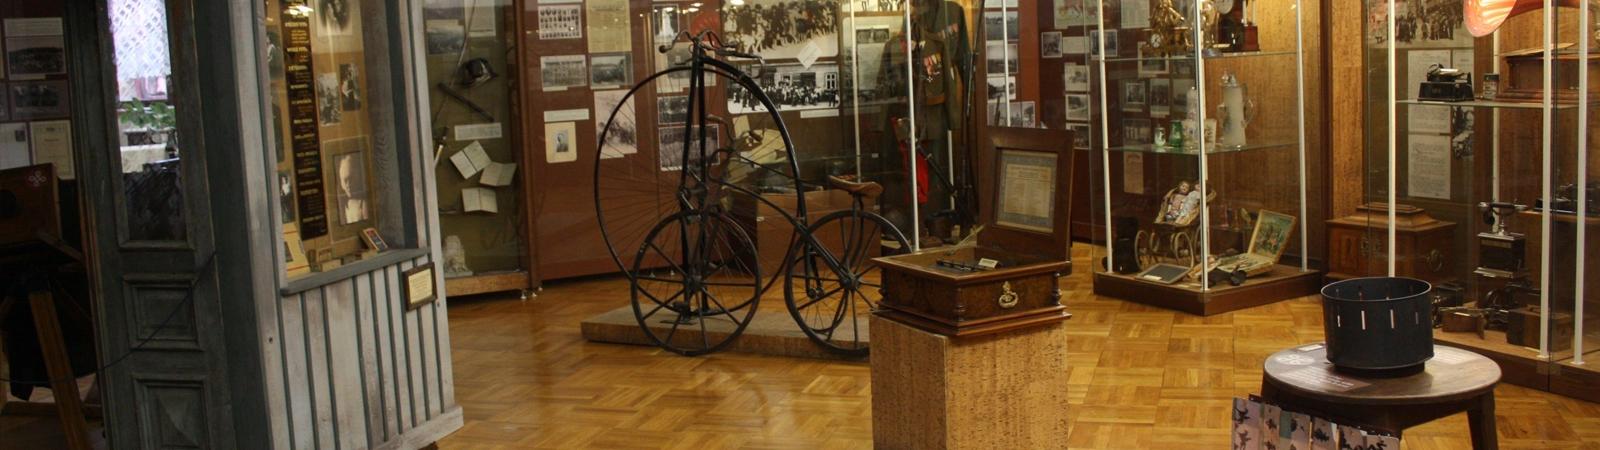 Stálá expozice muzea